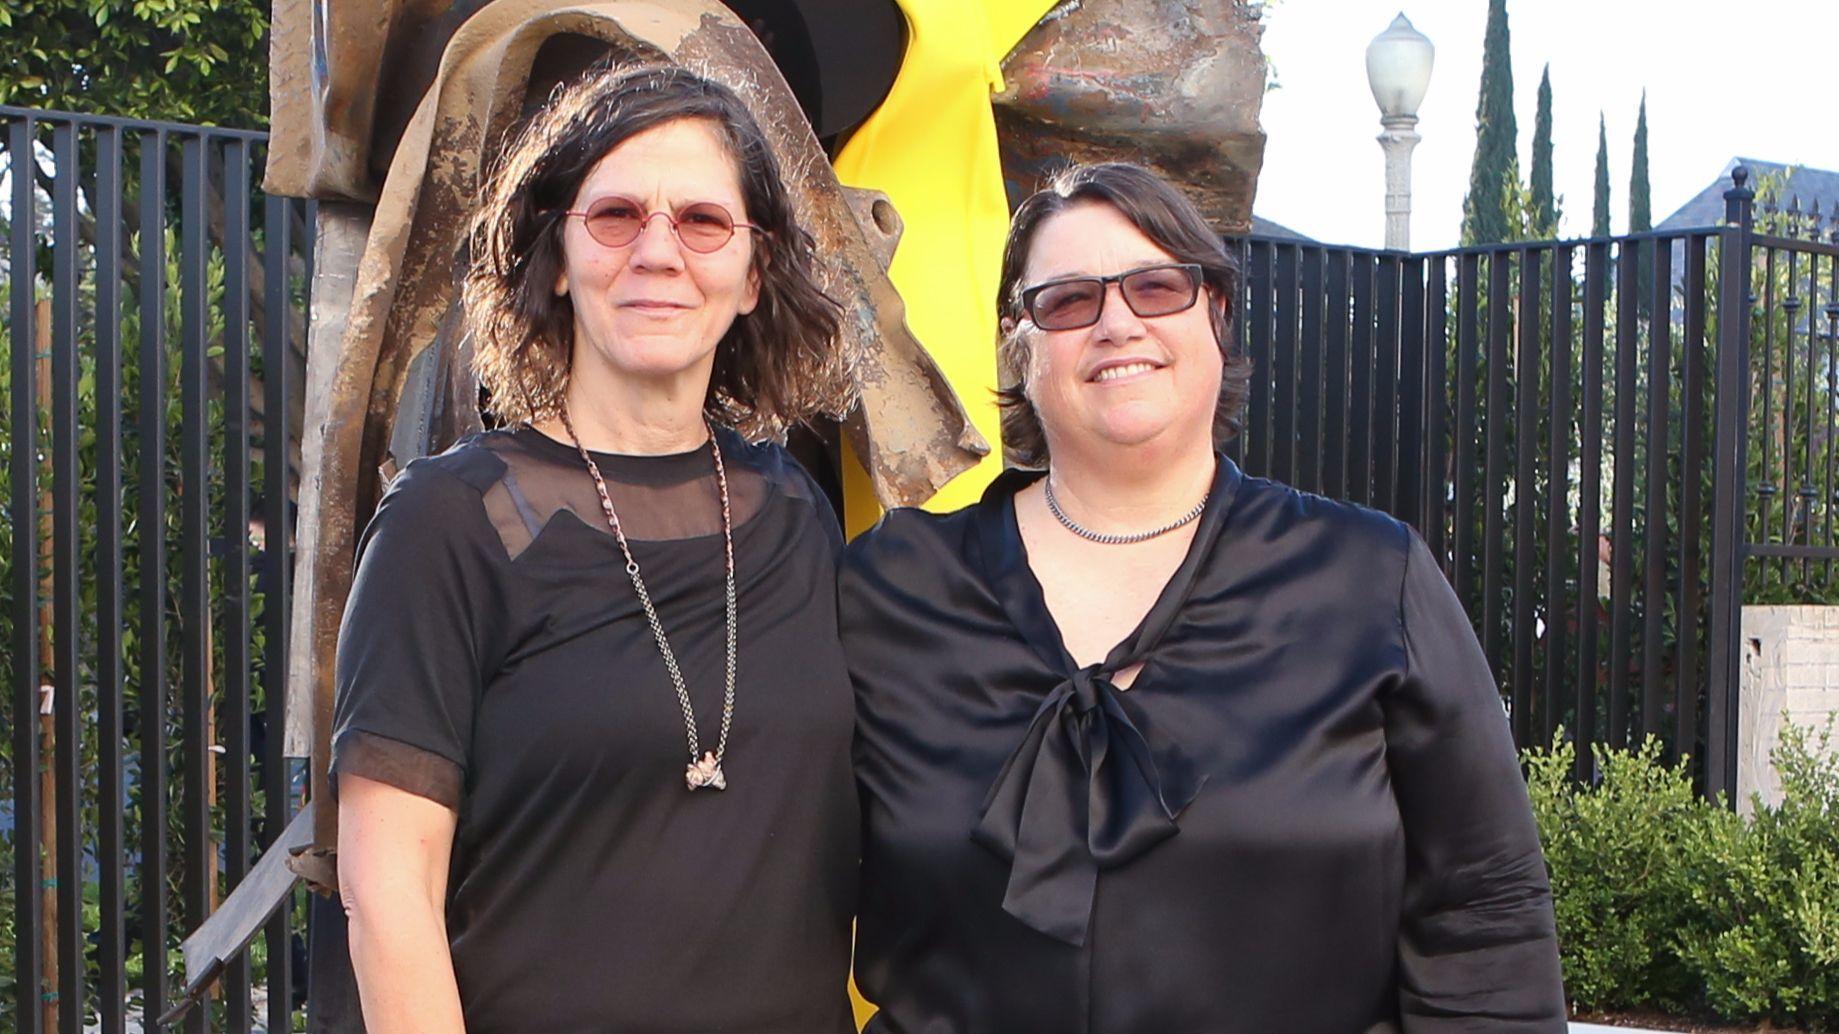 Garden designer Julie Burleigh and artist Catherine Opie.